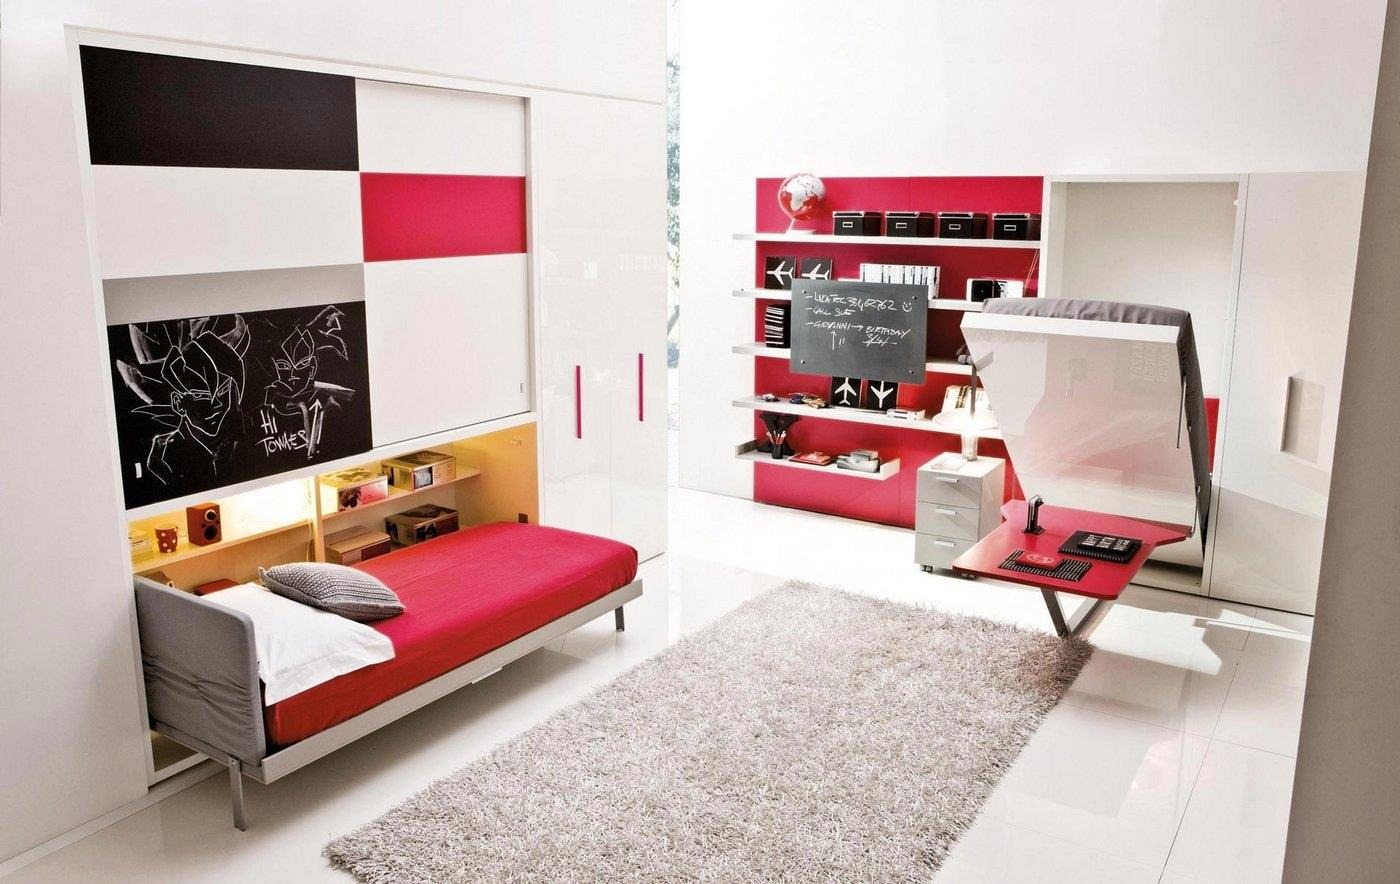 mobila inteligenta transformare birou in pat